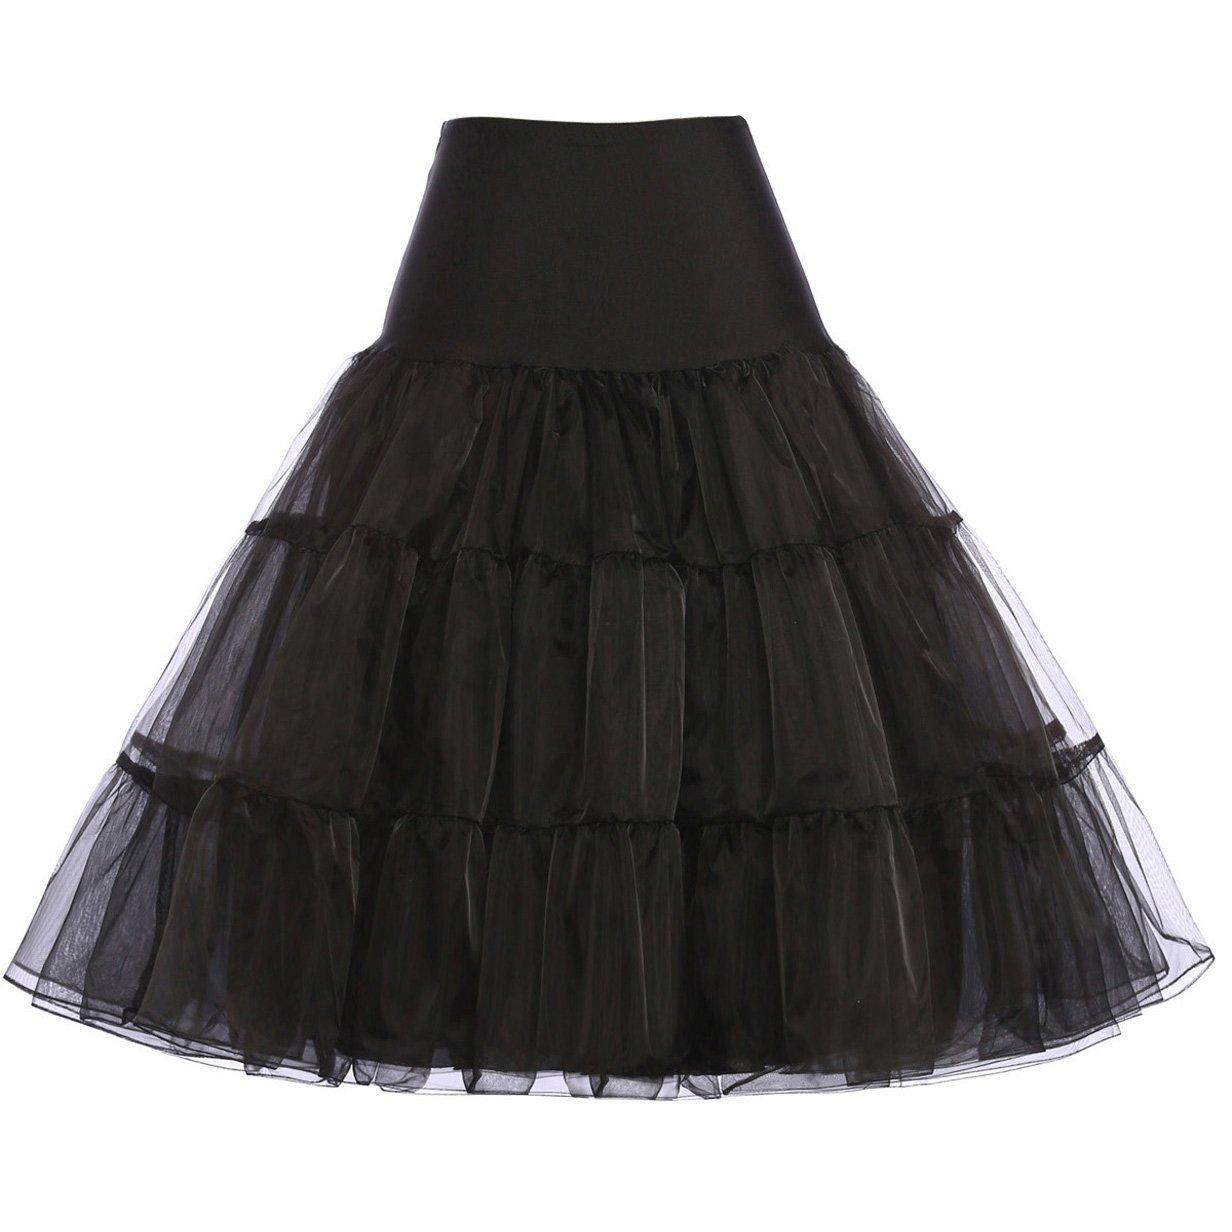 GRACE KARIN Women 50s Petticoat Skirts Tutu Crinoline Underskirt CL8922 15006766